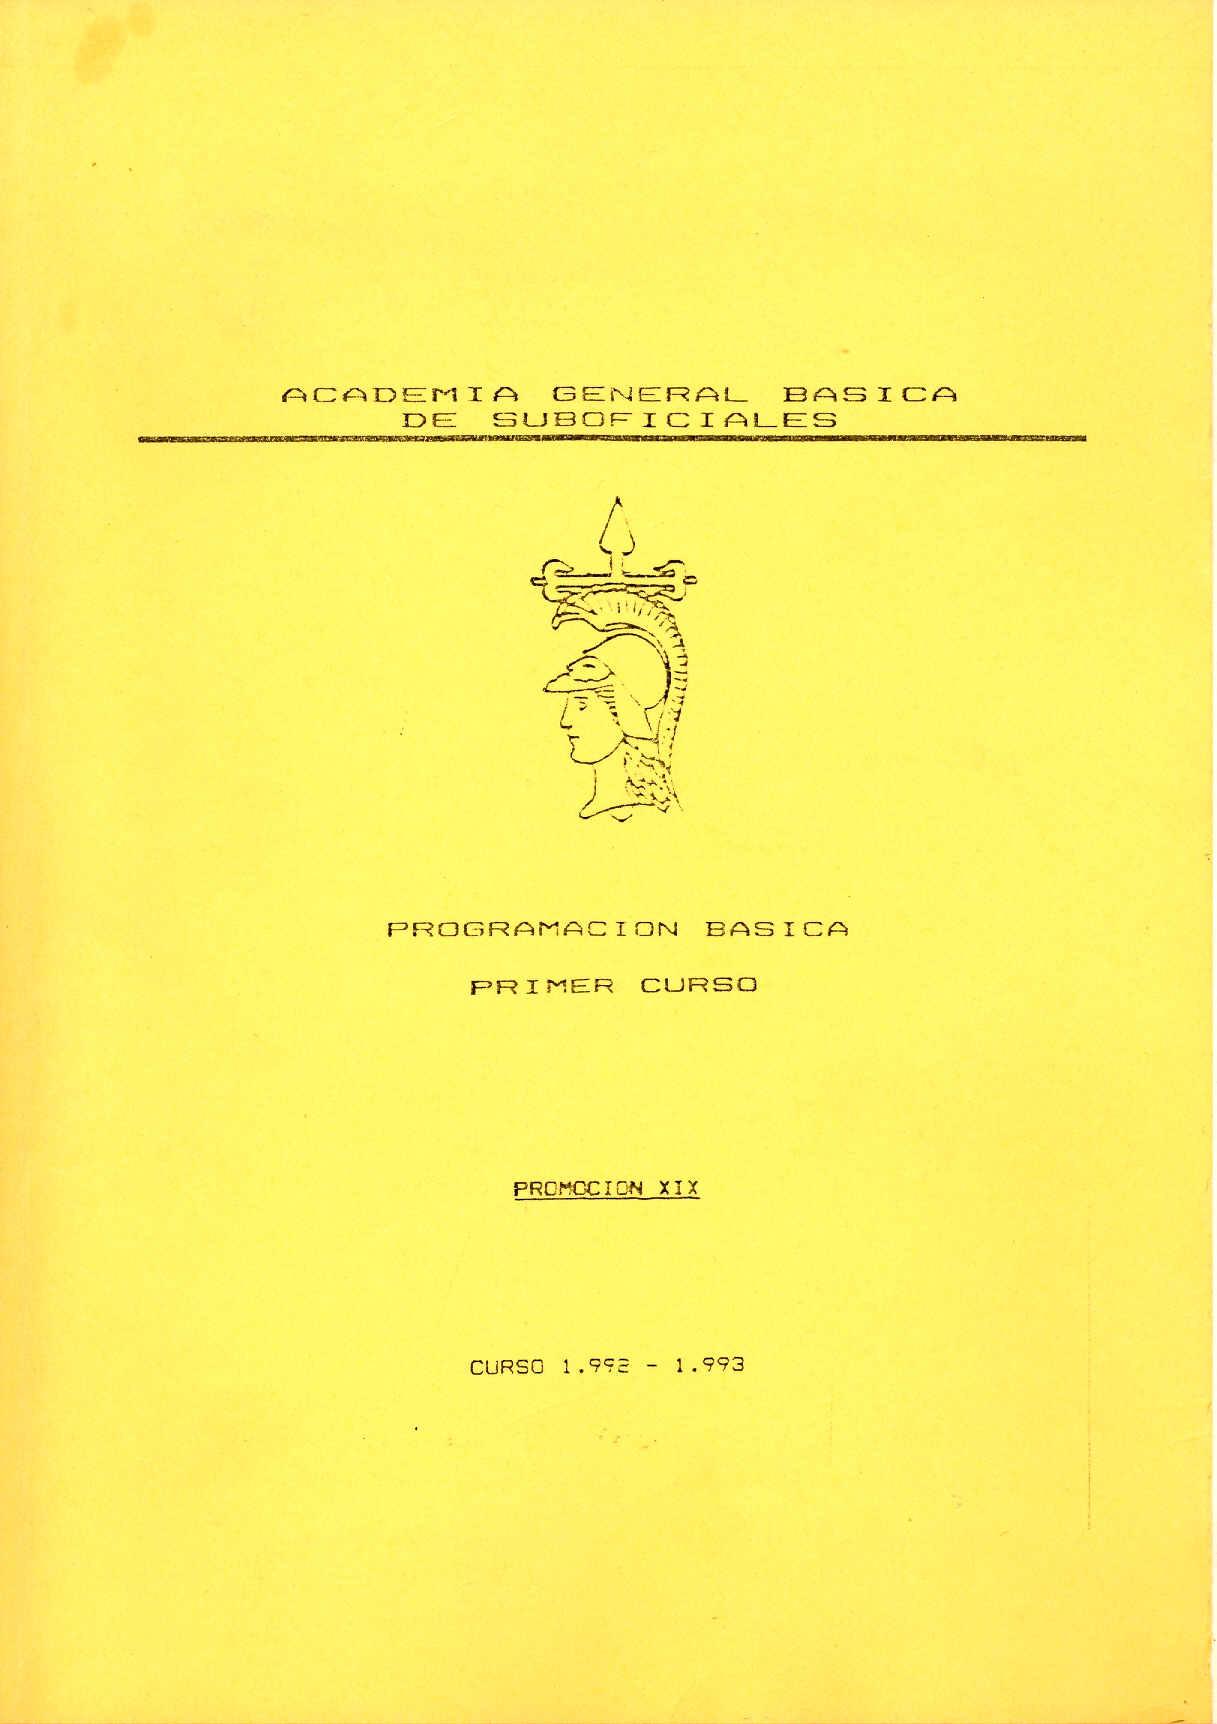 AMESETE. AGBS. Prog. Est. XIX P. 1º C. 1992-93